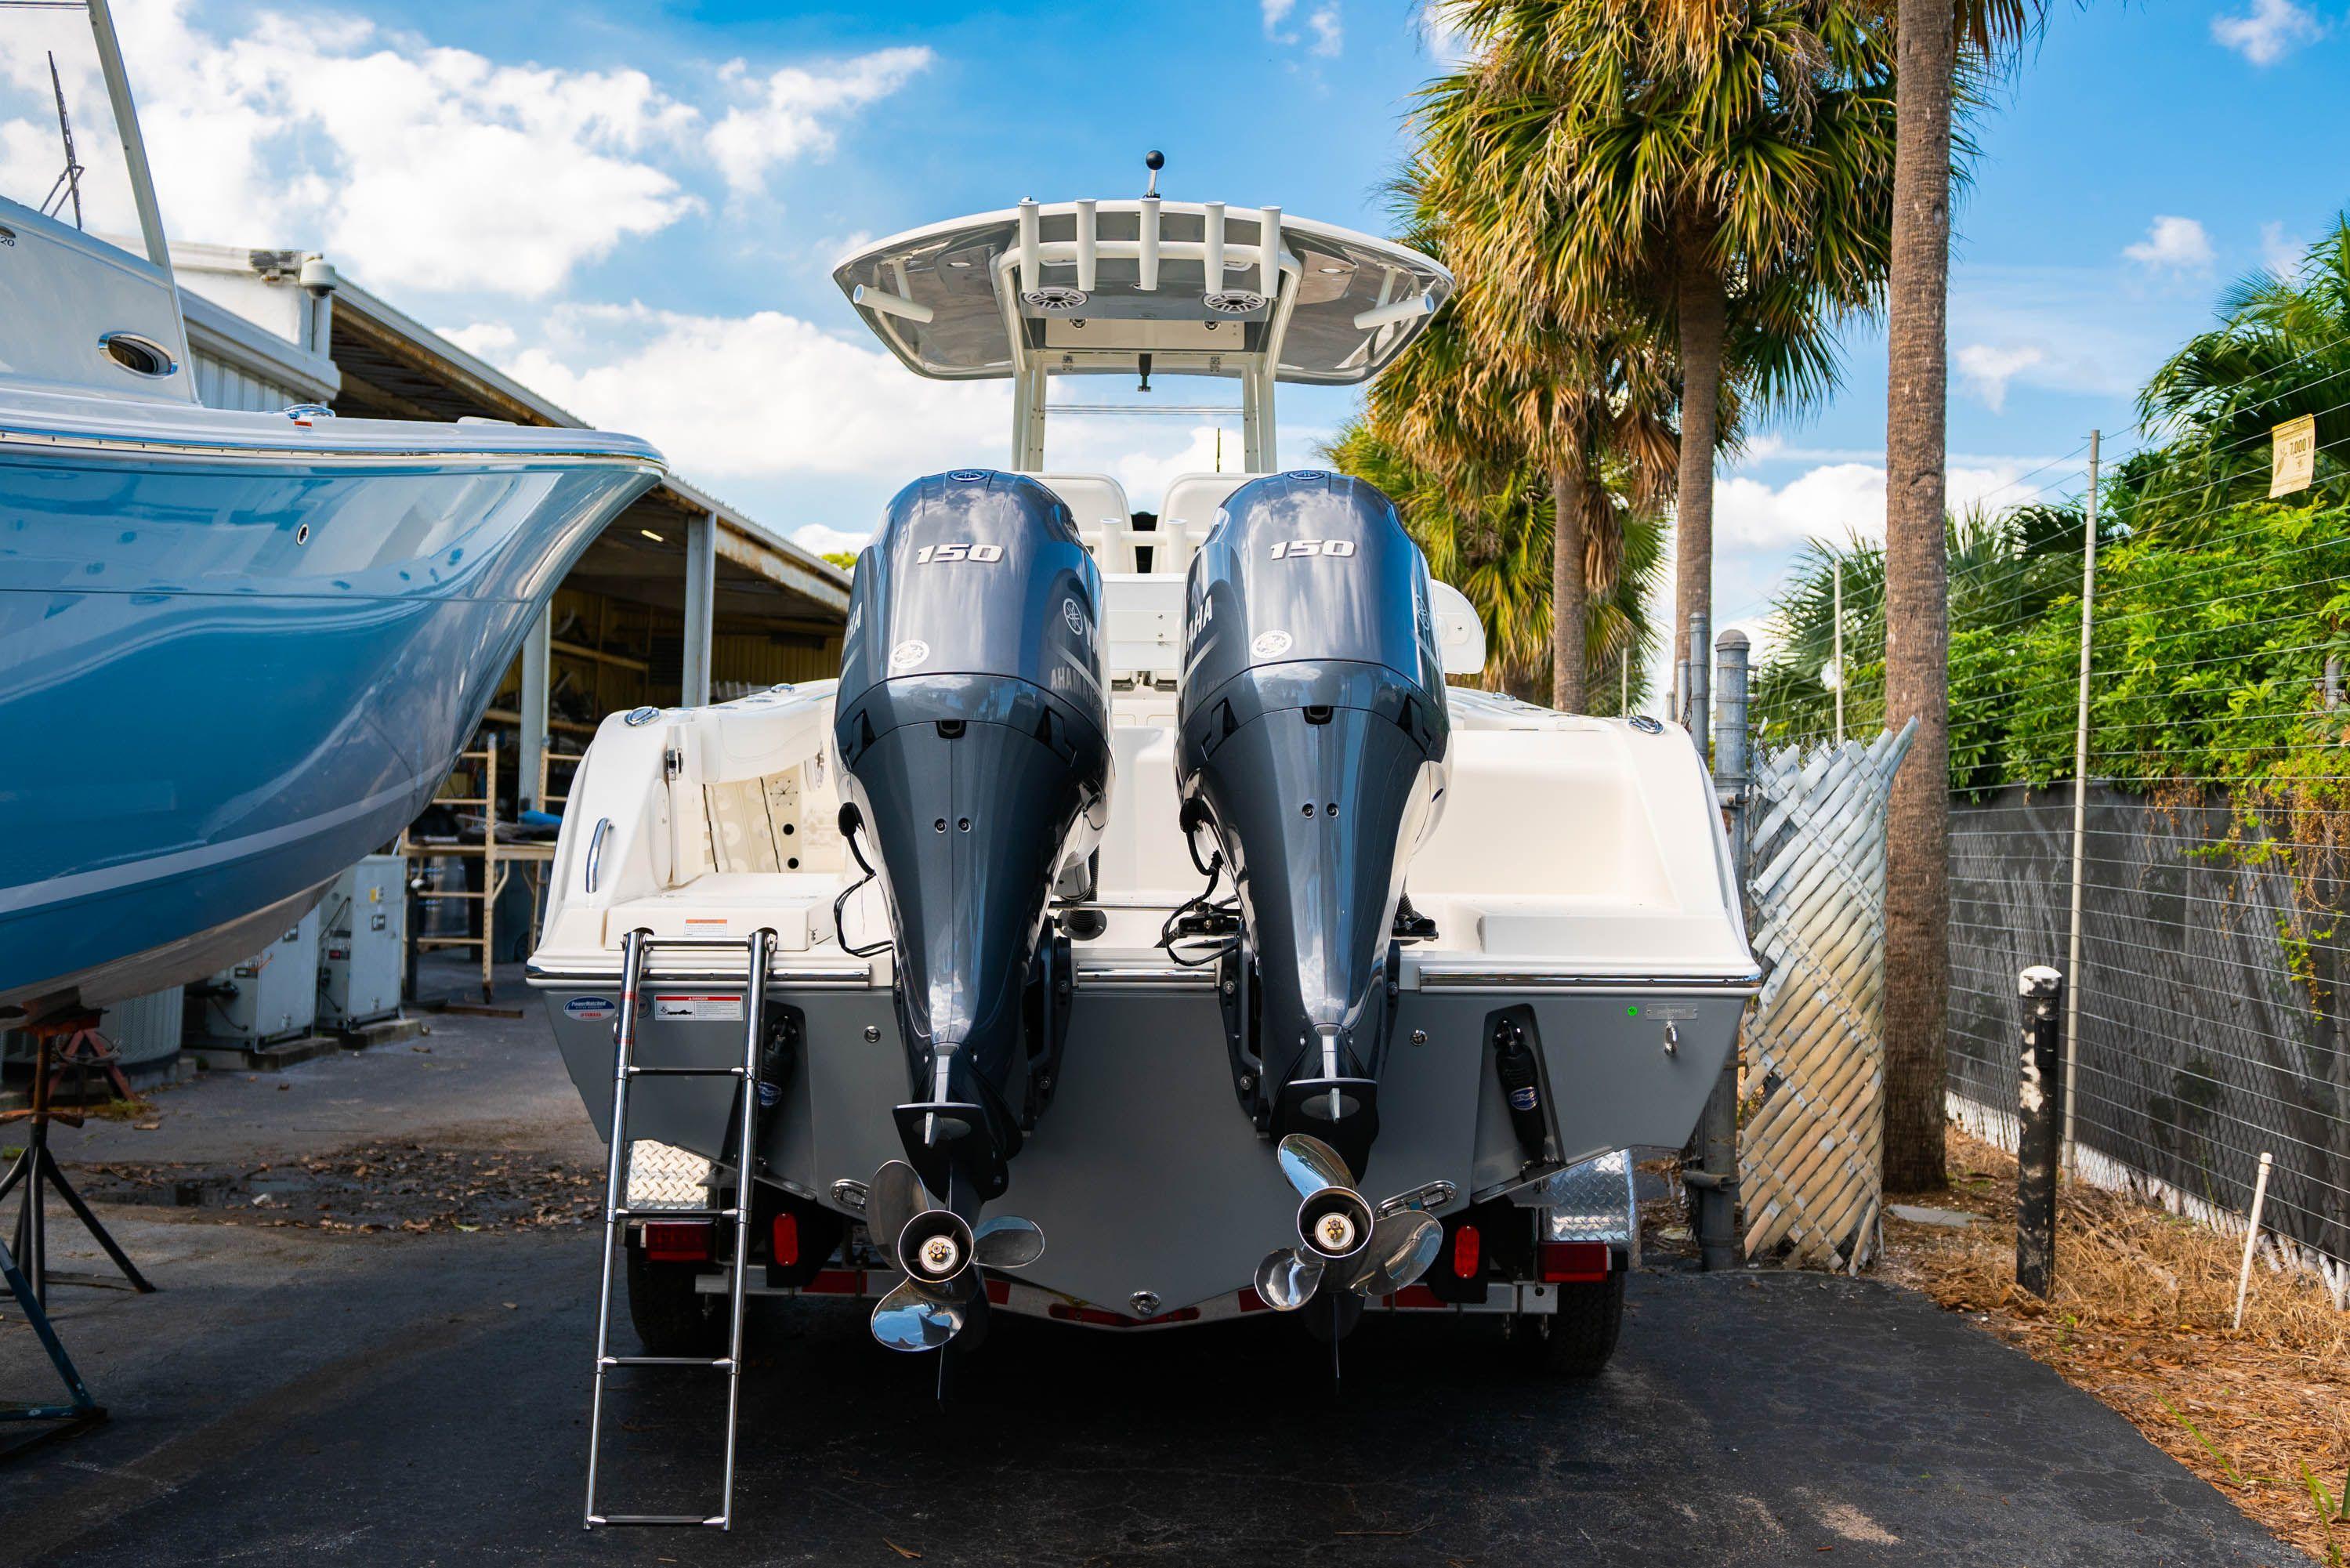 Thumbnail 2 for New 2020 Cobia 262 CC Center Console boat for sale in Vero Beach, FL